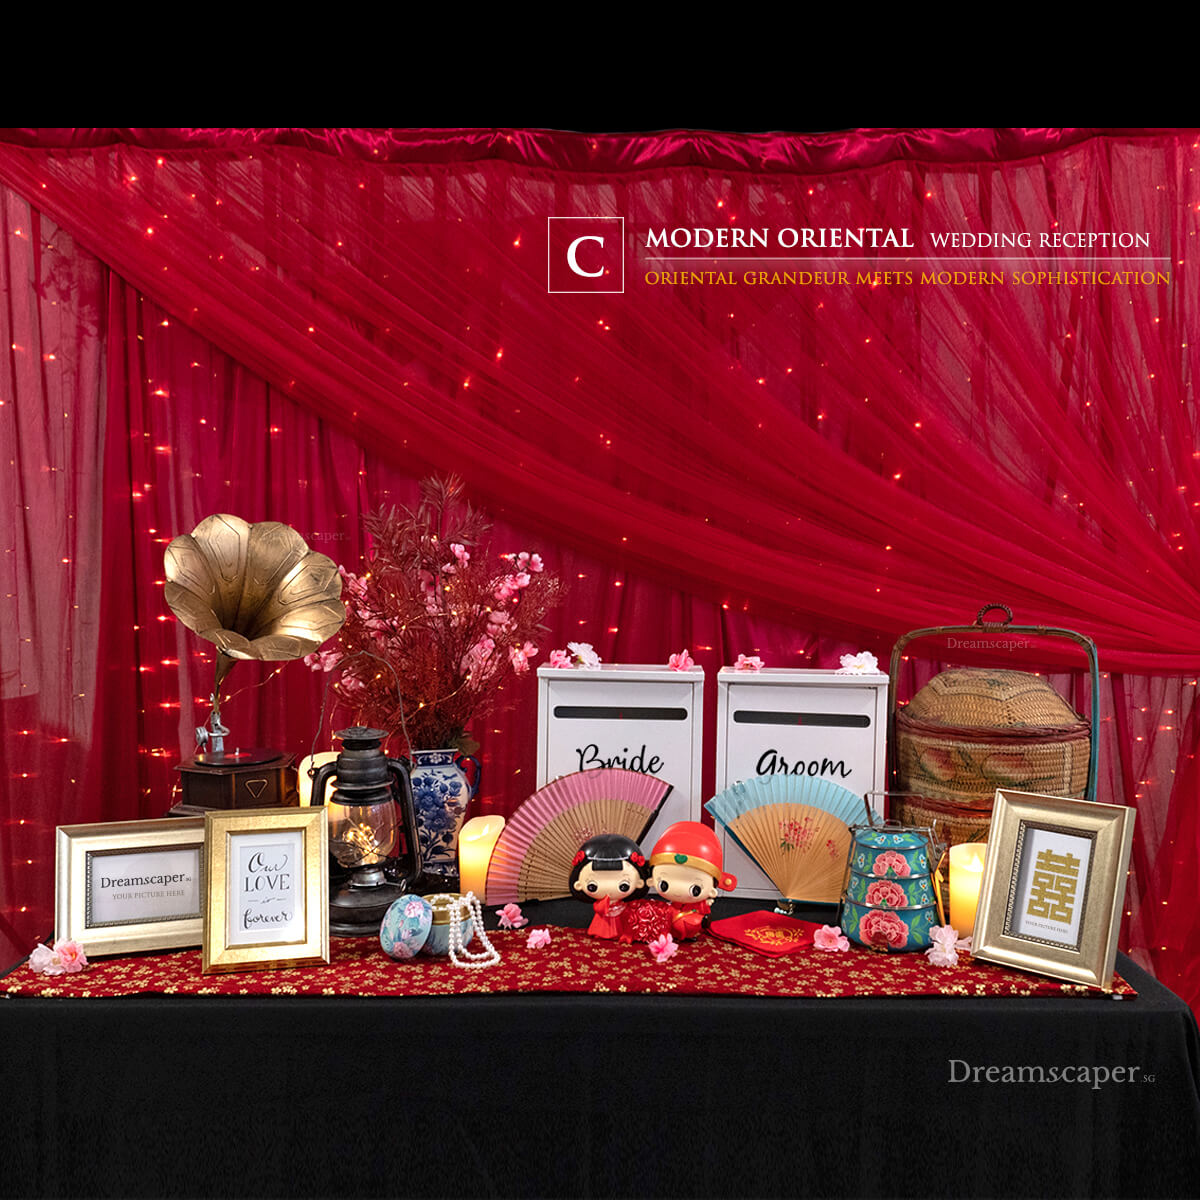 Modern Oriental Wedding Reception Package Singapore